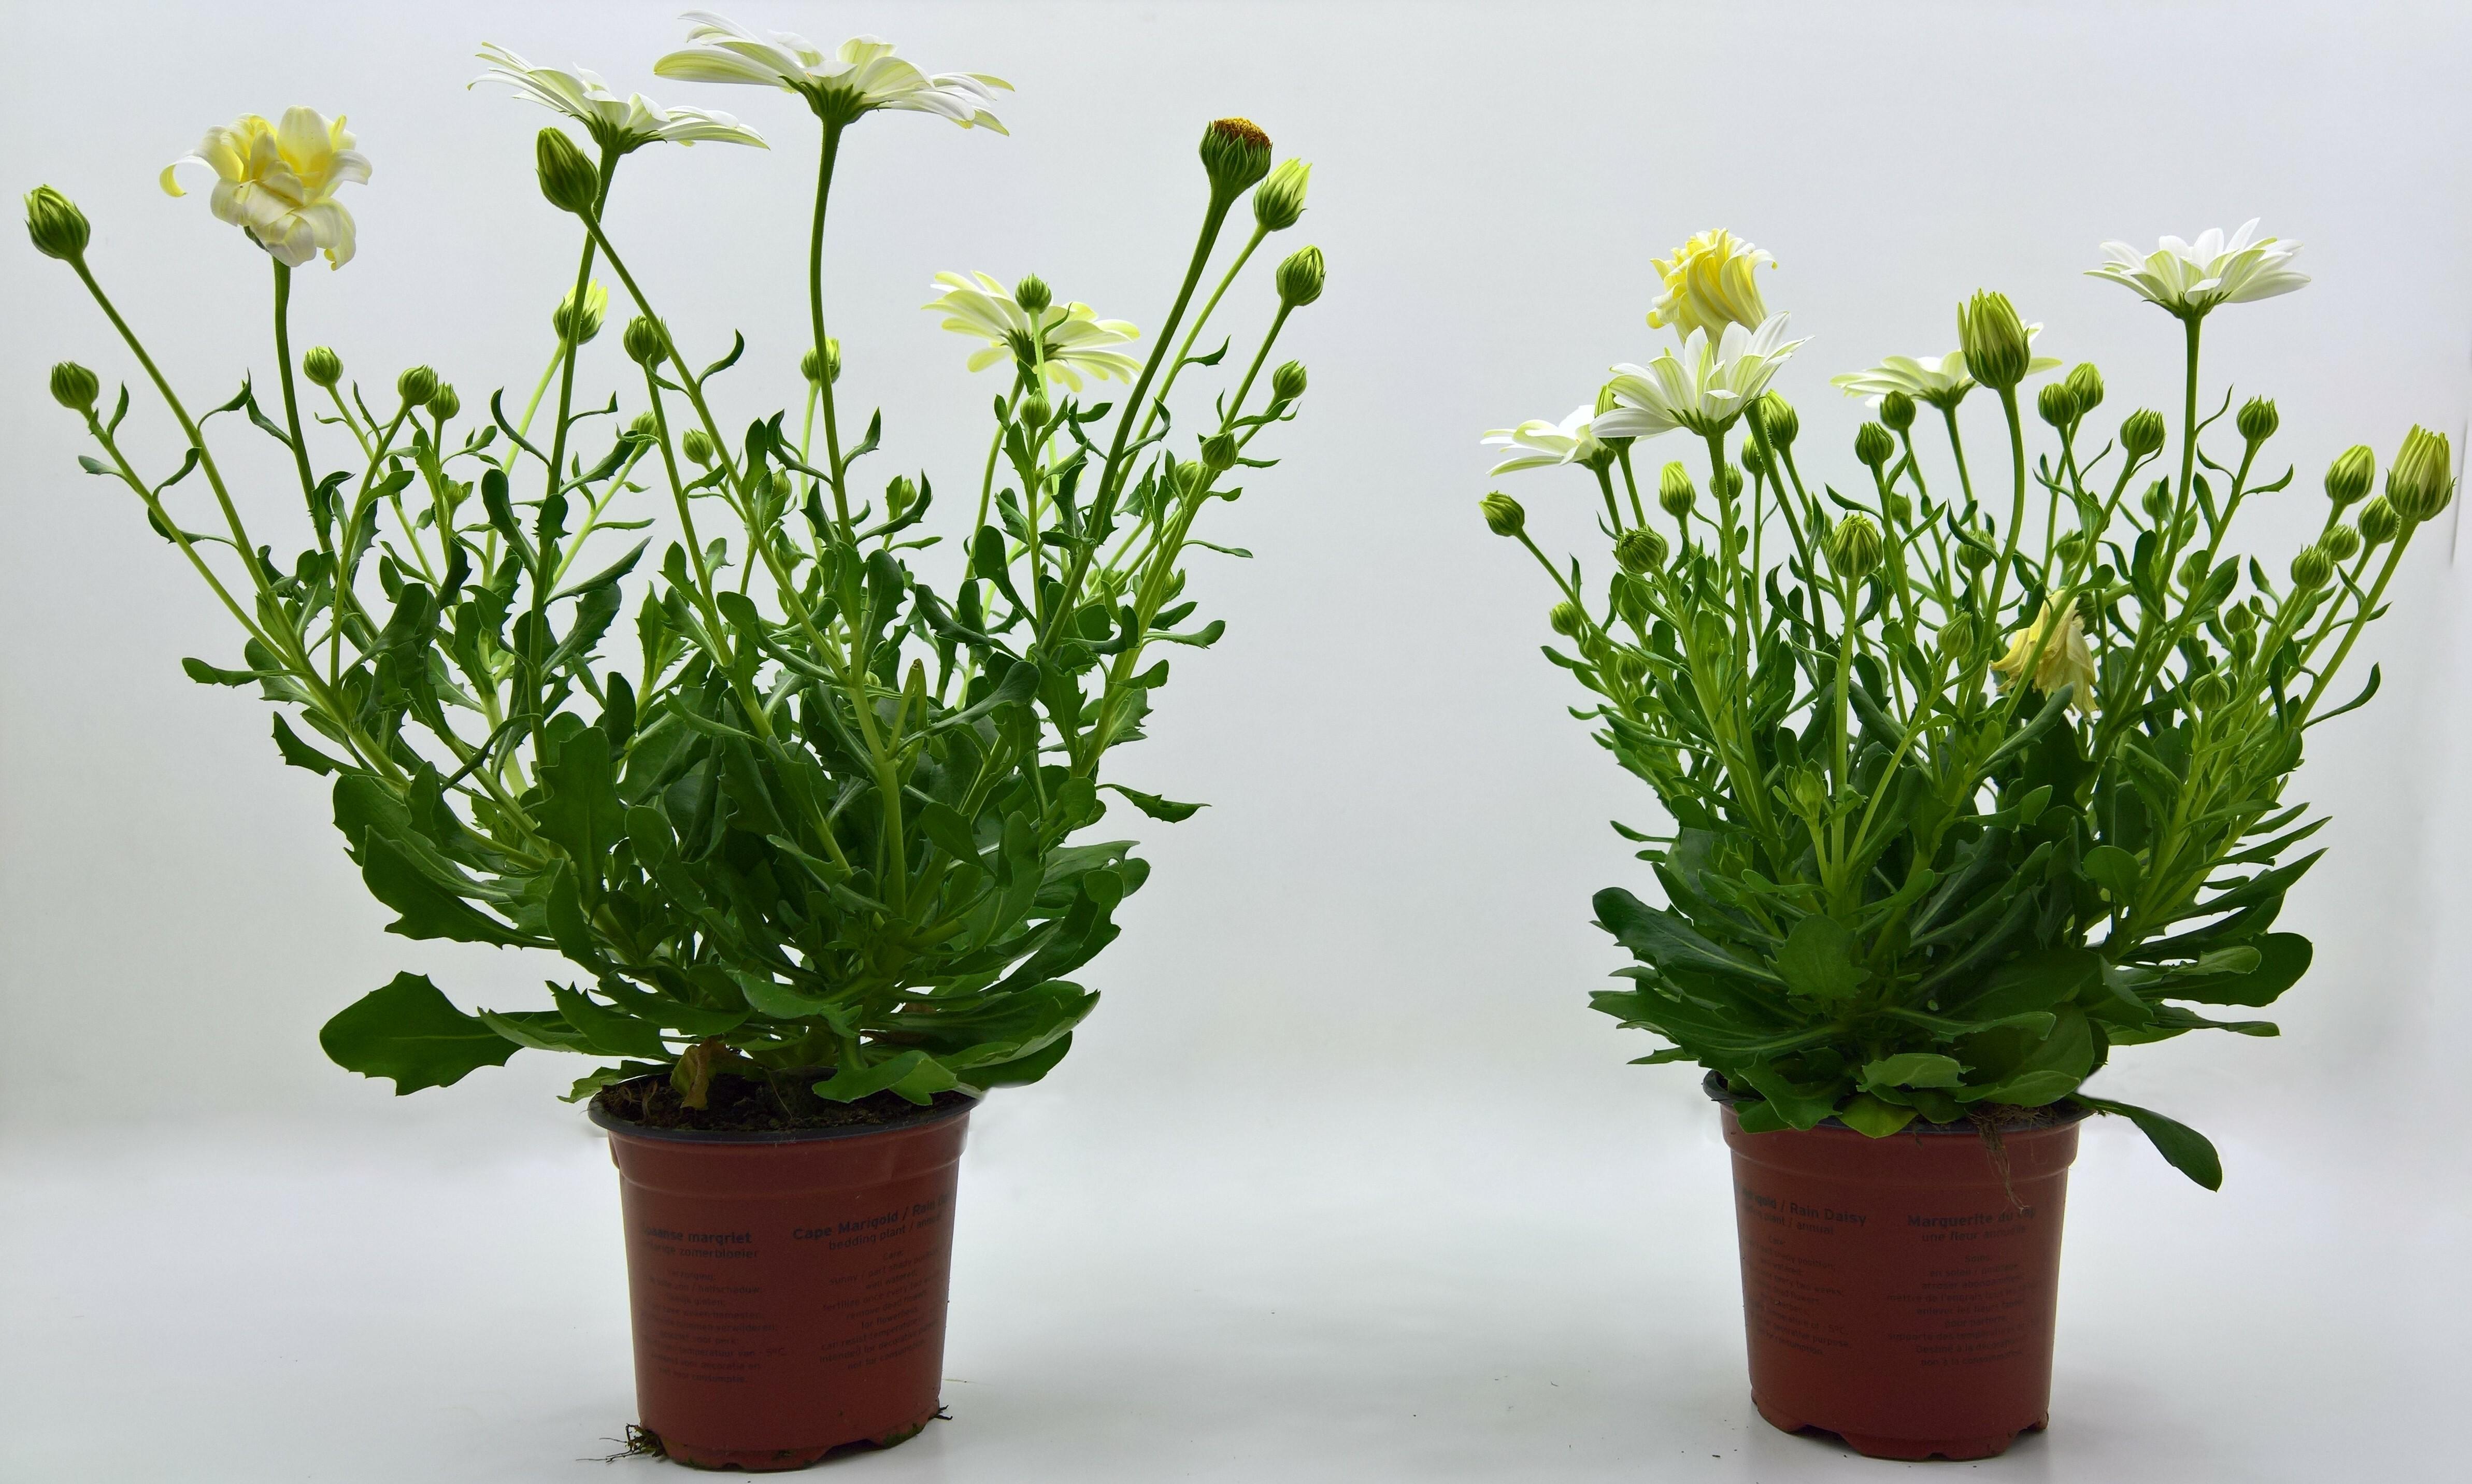 Osteospermum plants